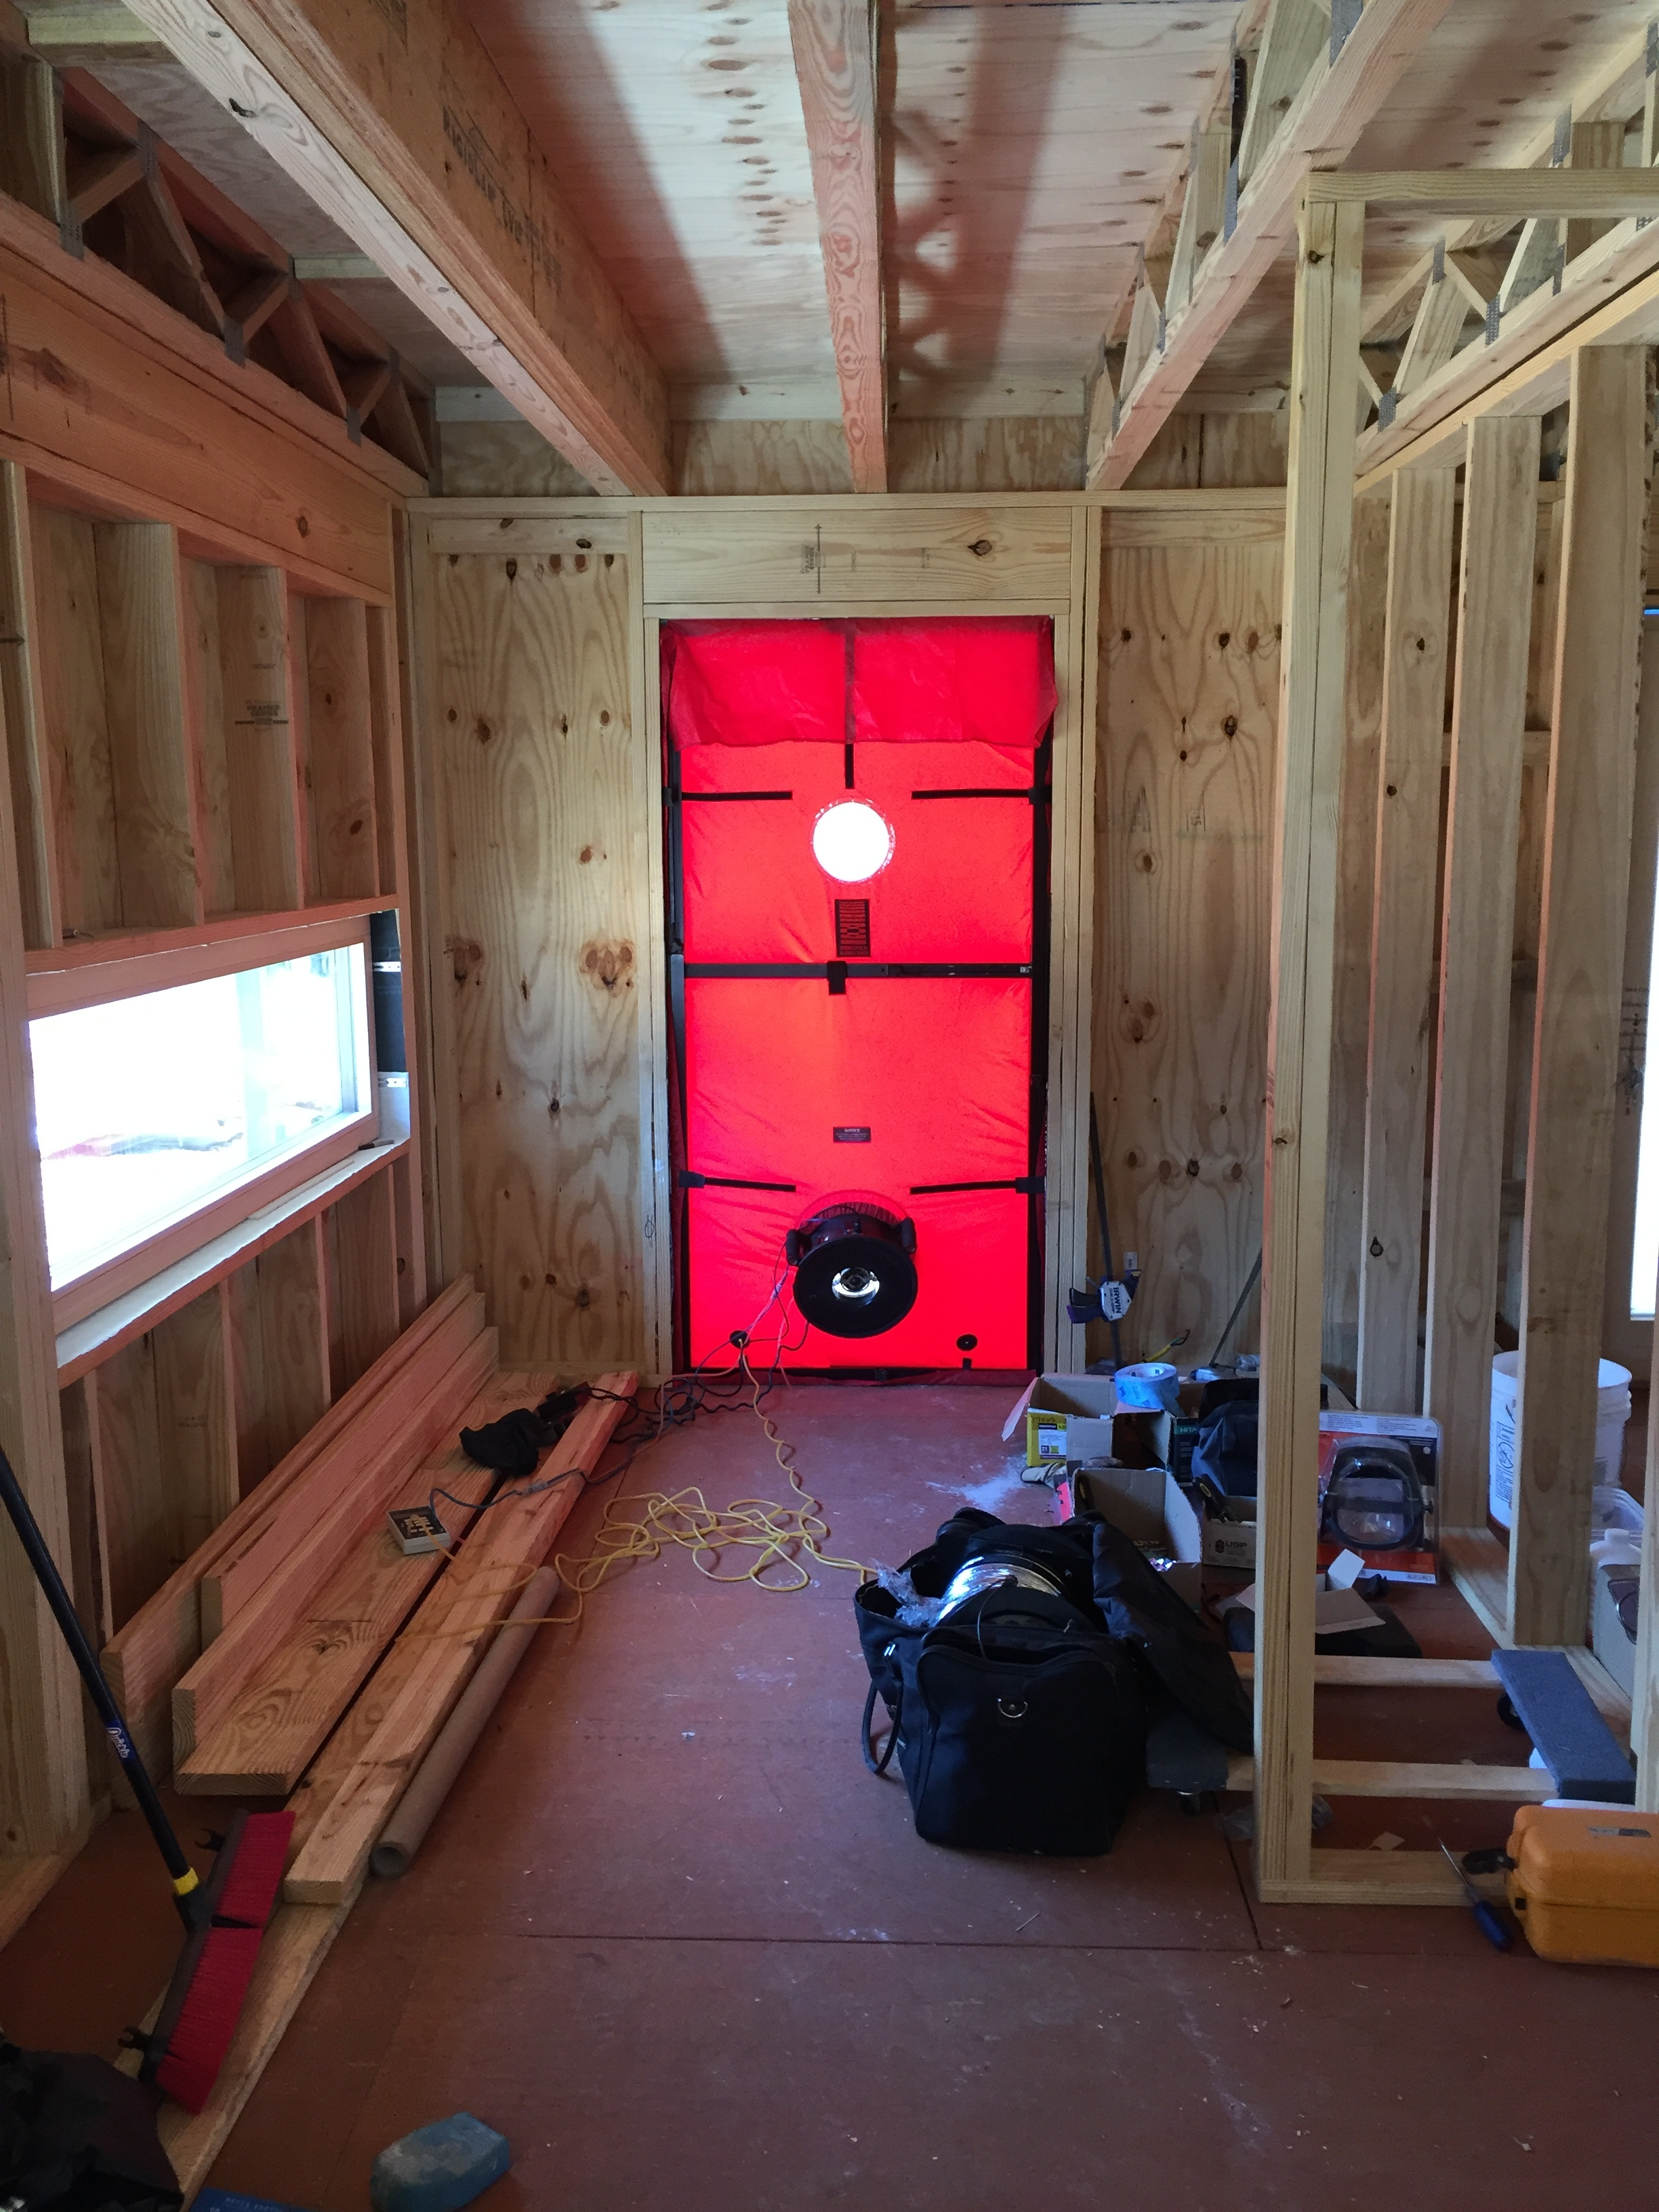 Blower Door Test in Batesville. Image: Daniel Ernst, Promethean Homes